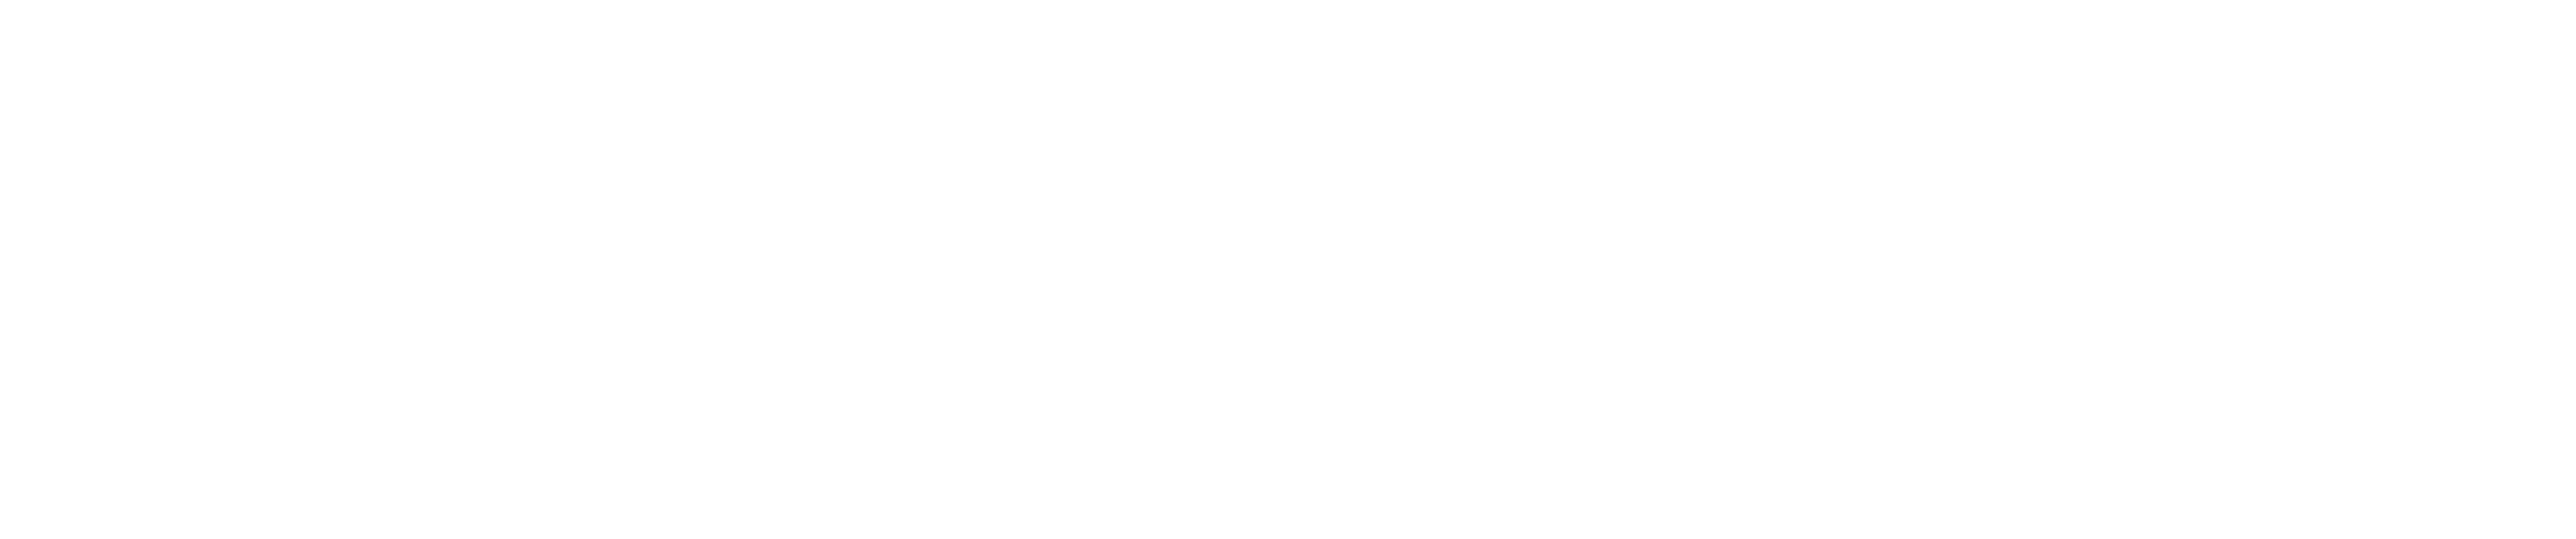 deepwatch-logo-white